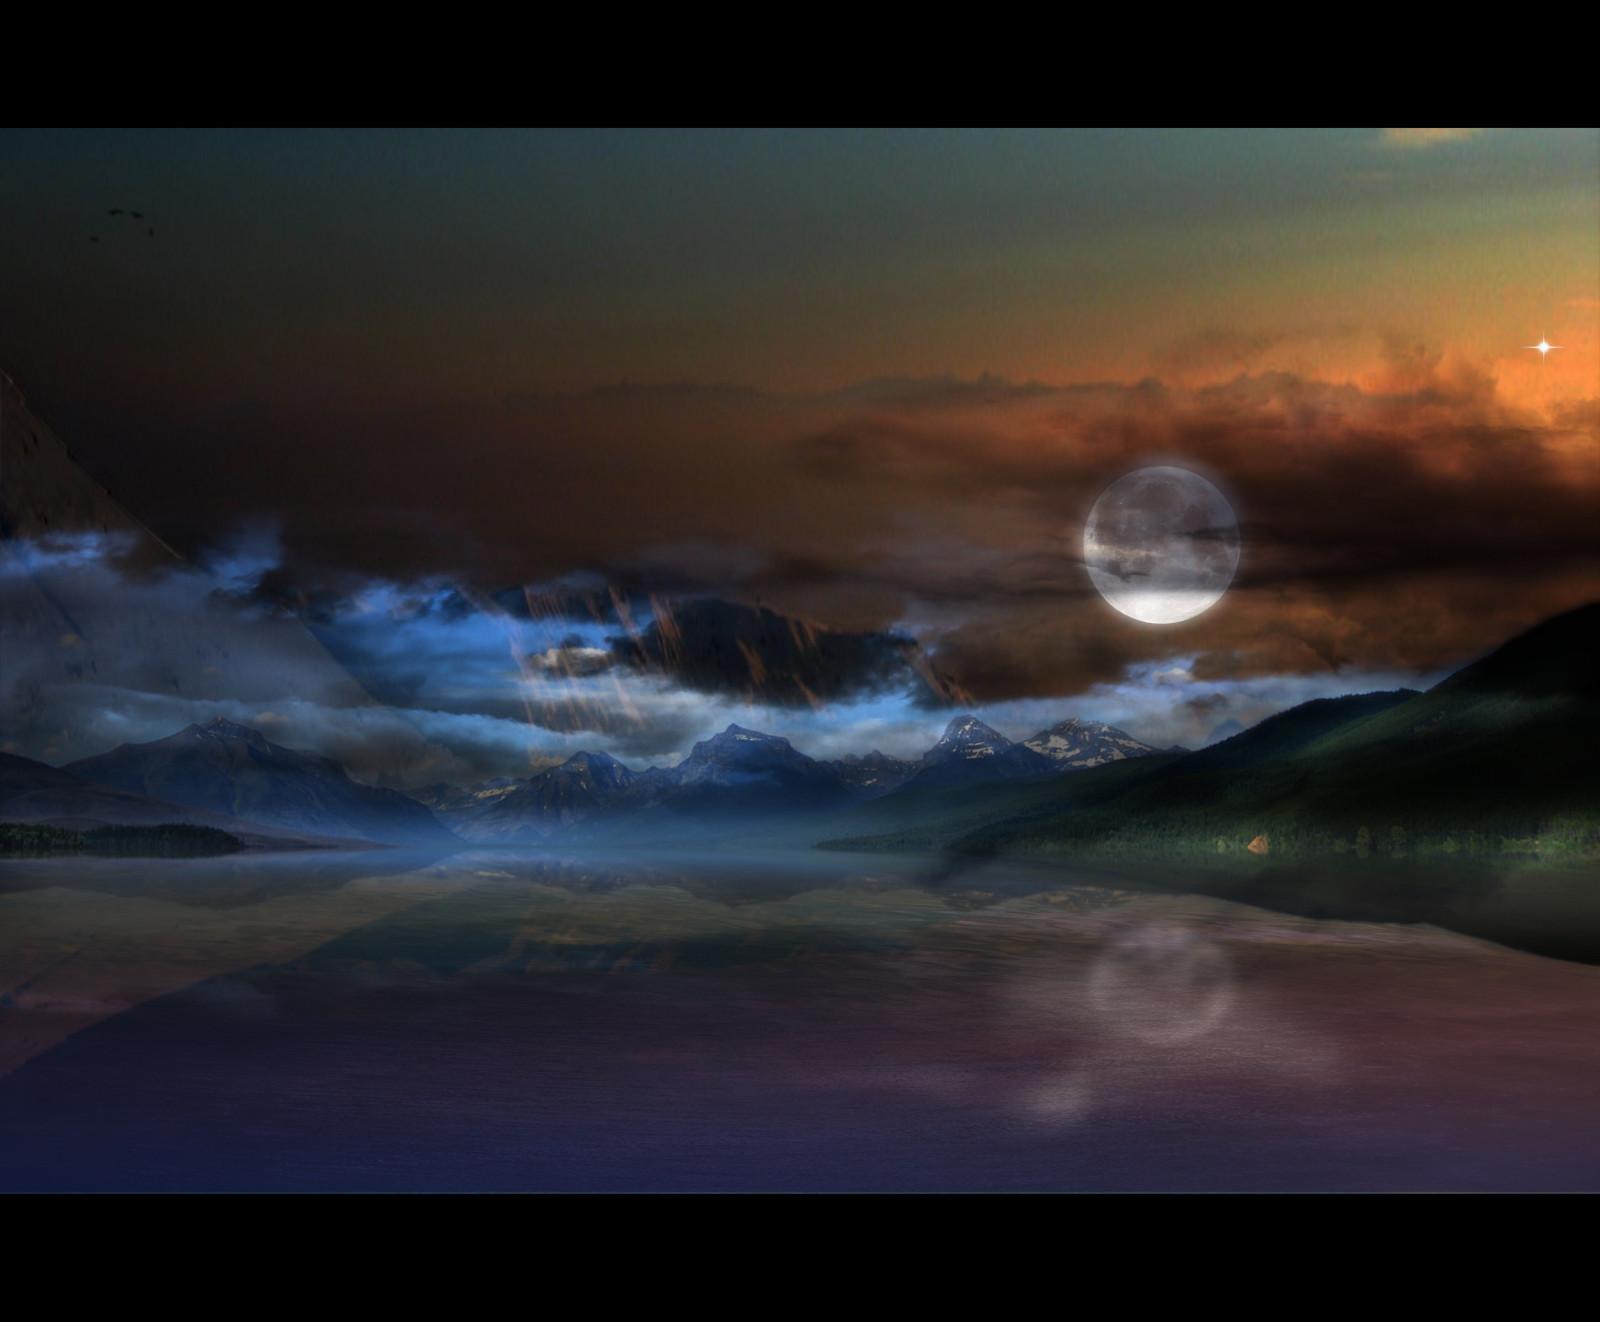 Wallpaper ghost fantome moon dark mattepainting photoshop cs3 theperfectphotographer - Ghost fantome ...